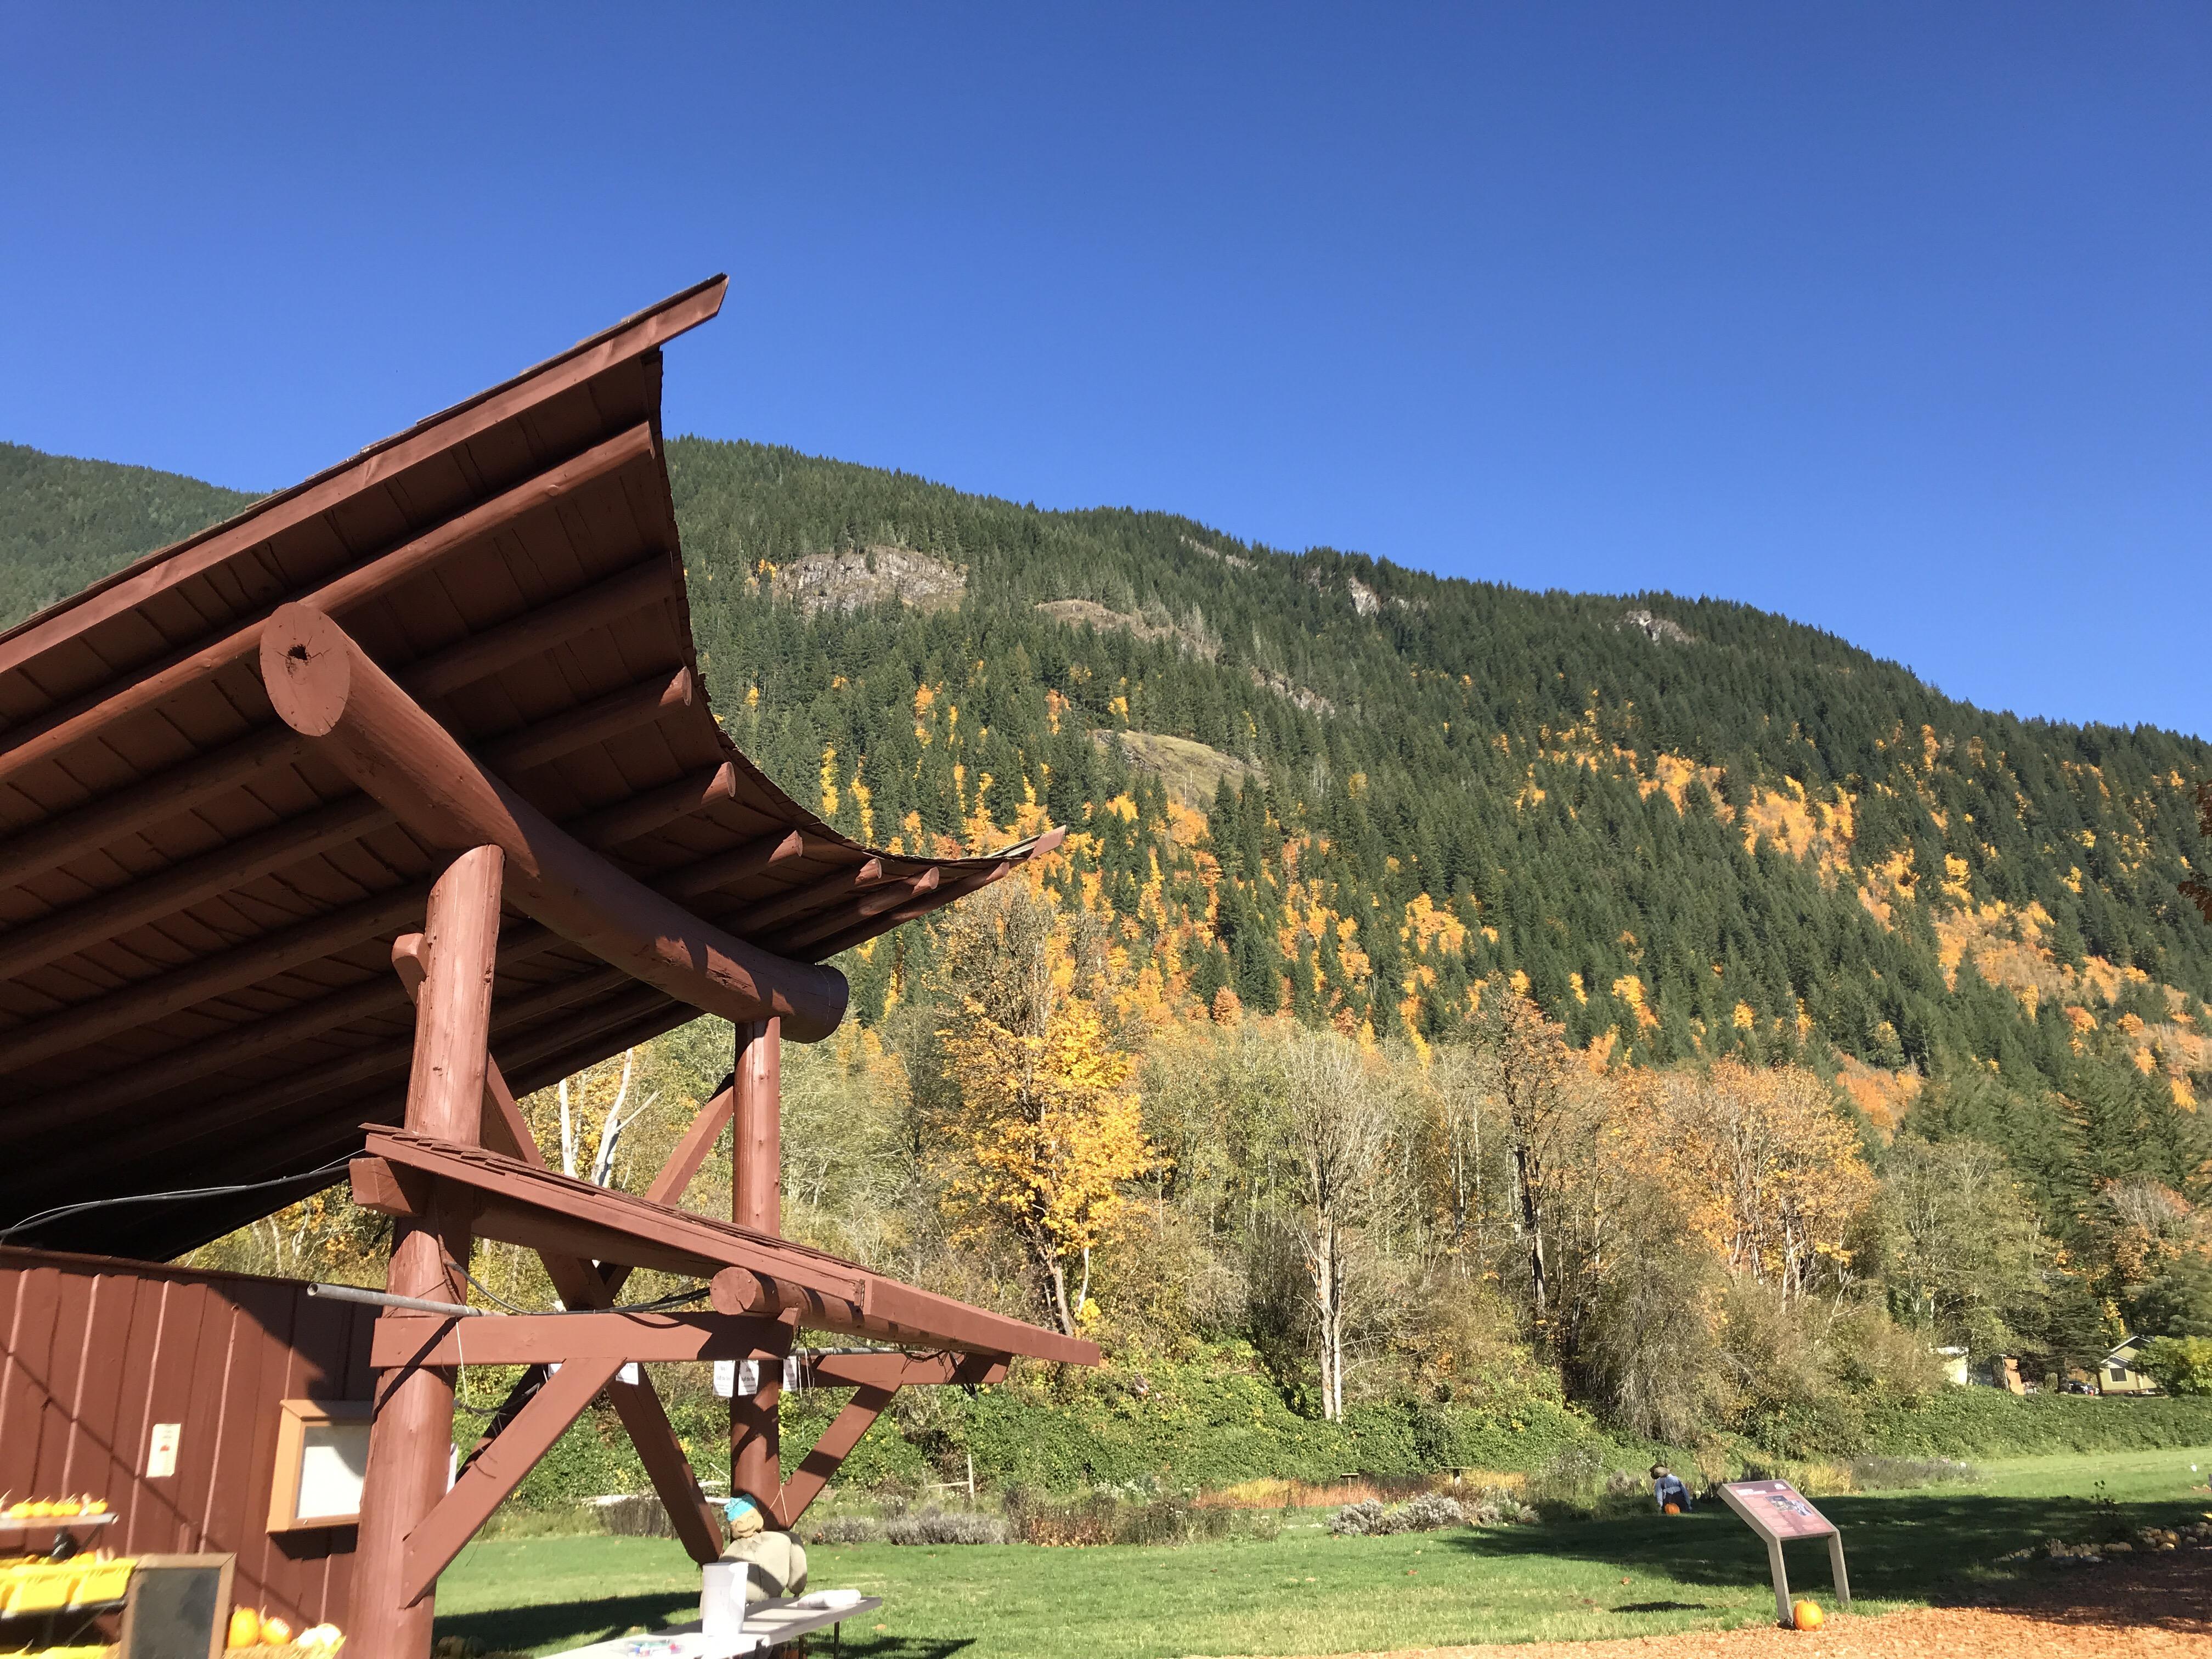 People of the Upper Skagit Sept 9-11, 2016 - Hope Mountain ... |Upper Skagit Valley